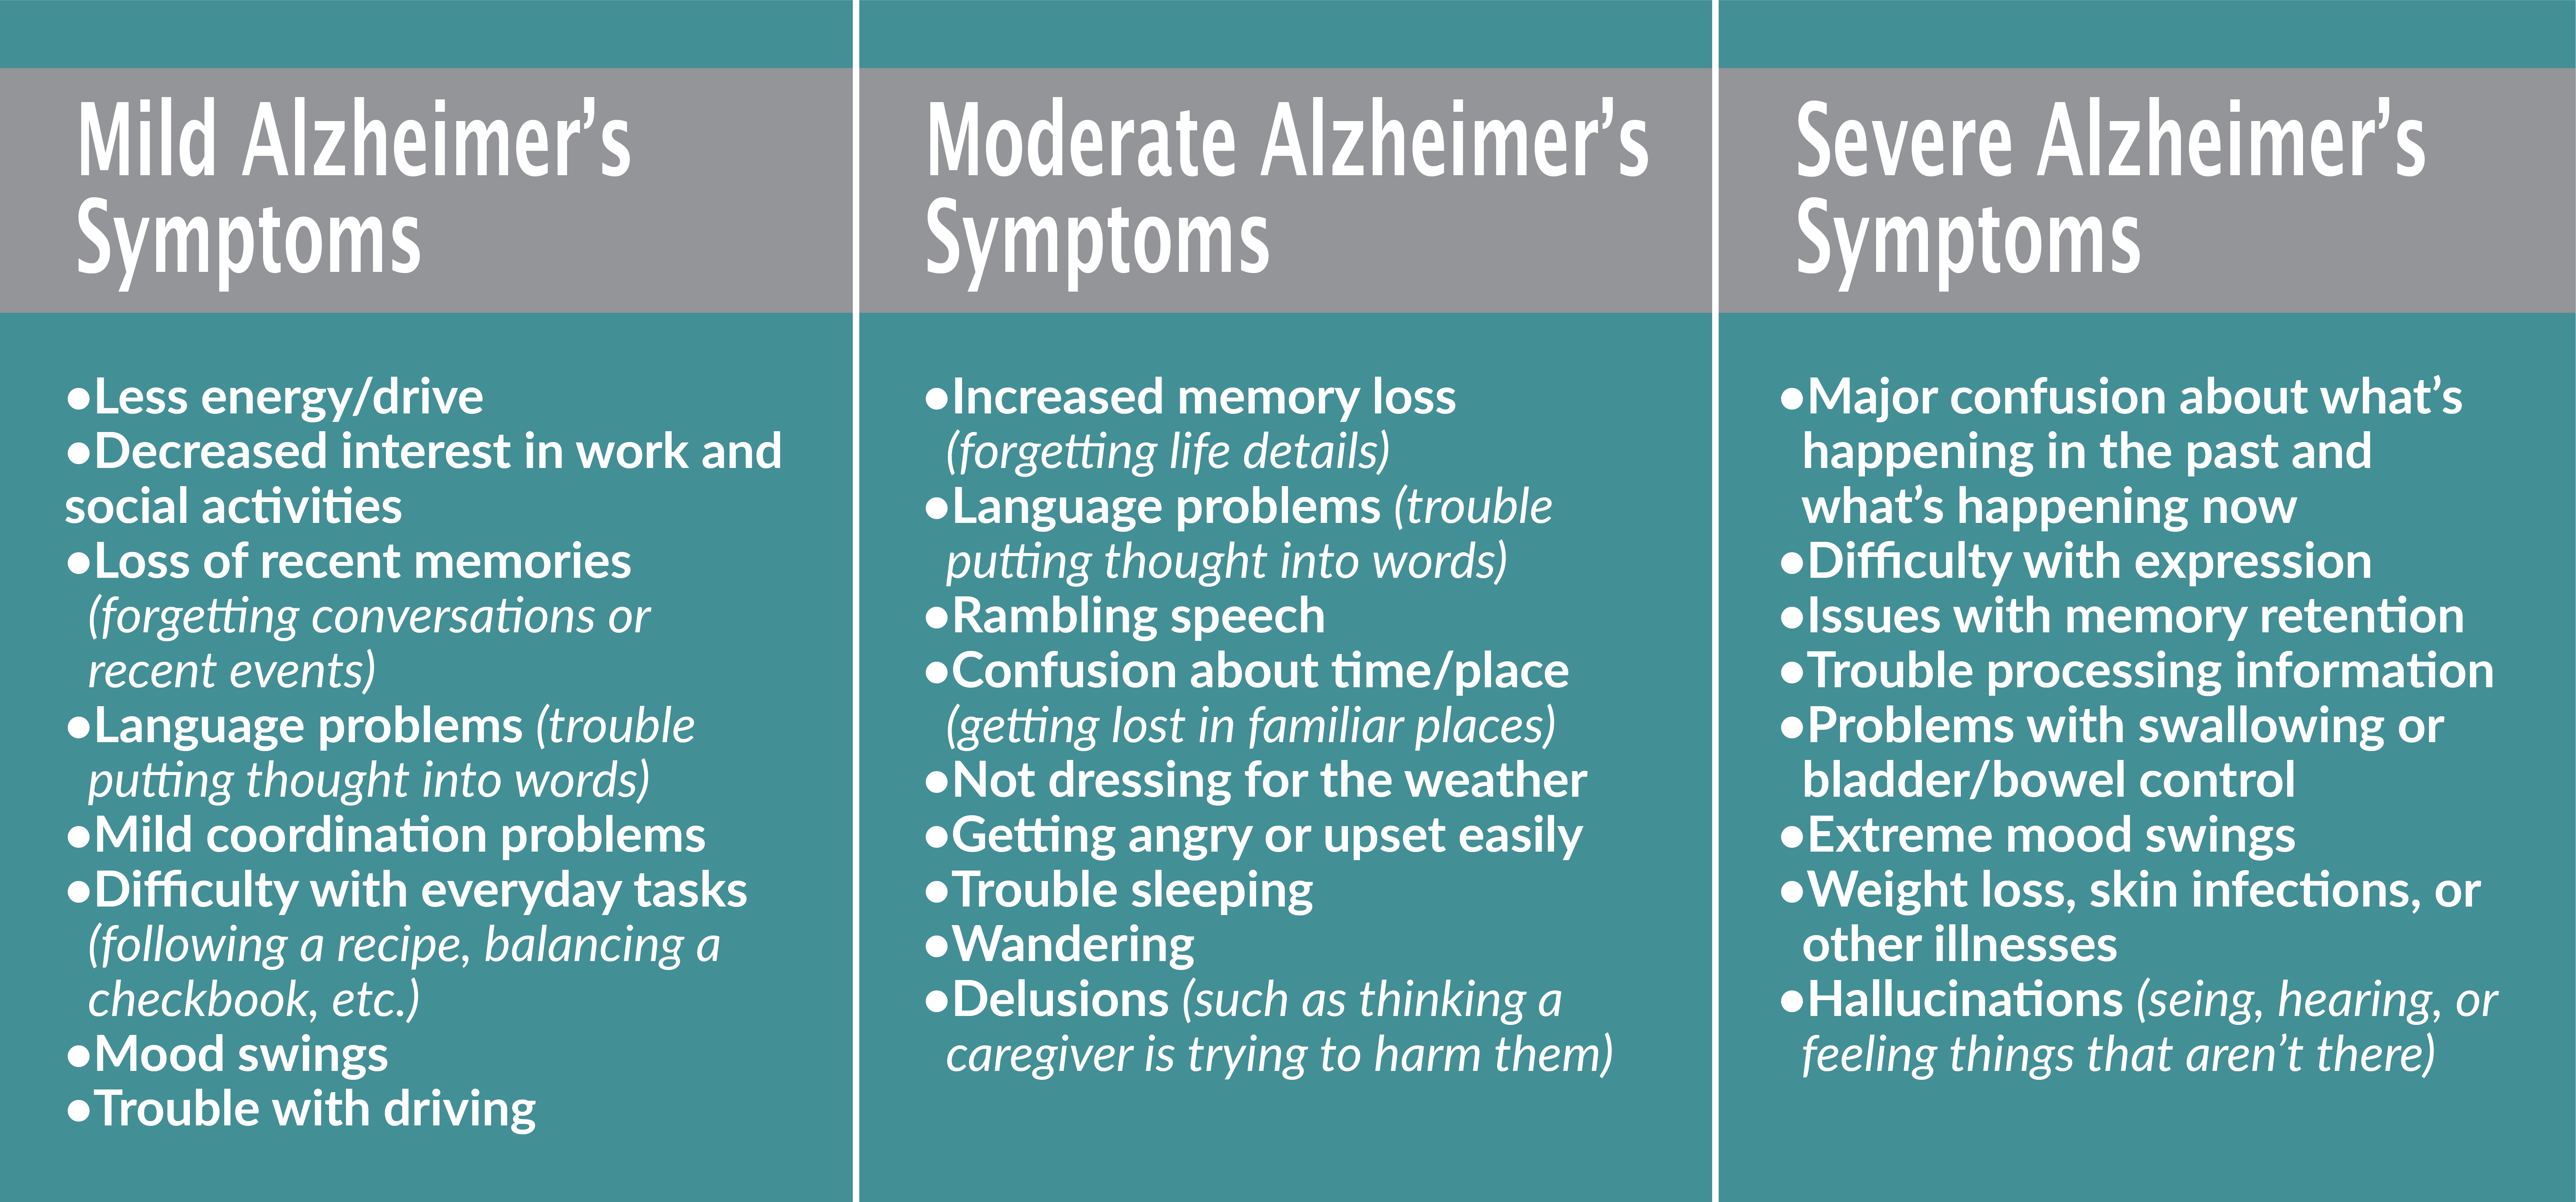 symptoms of alzheimers